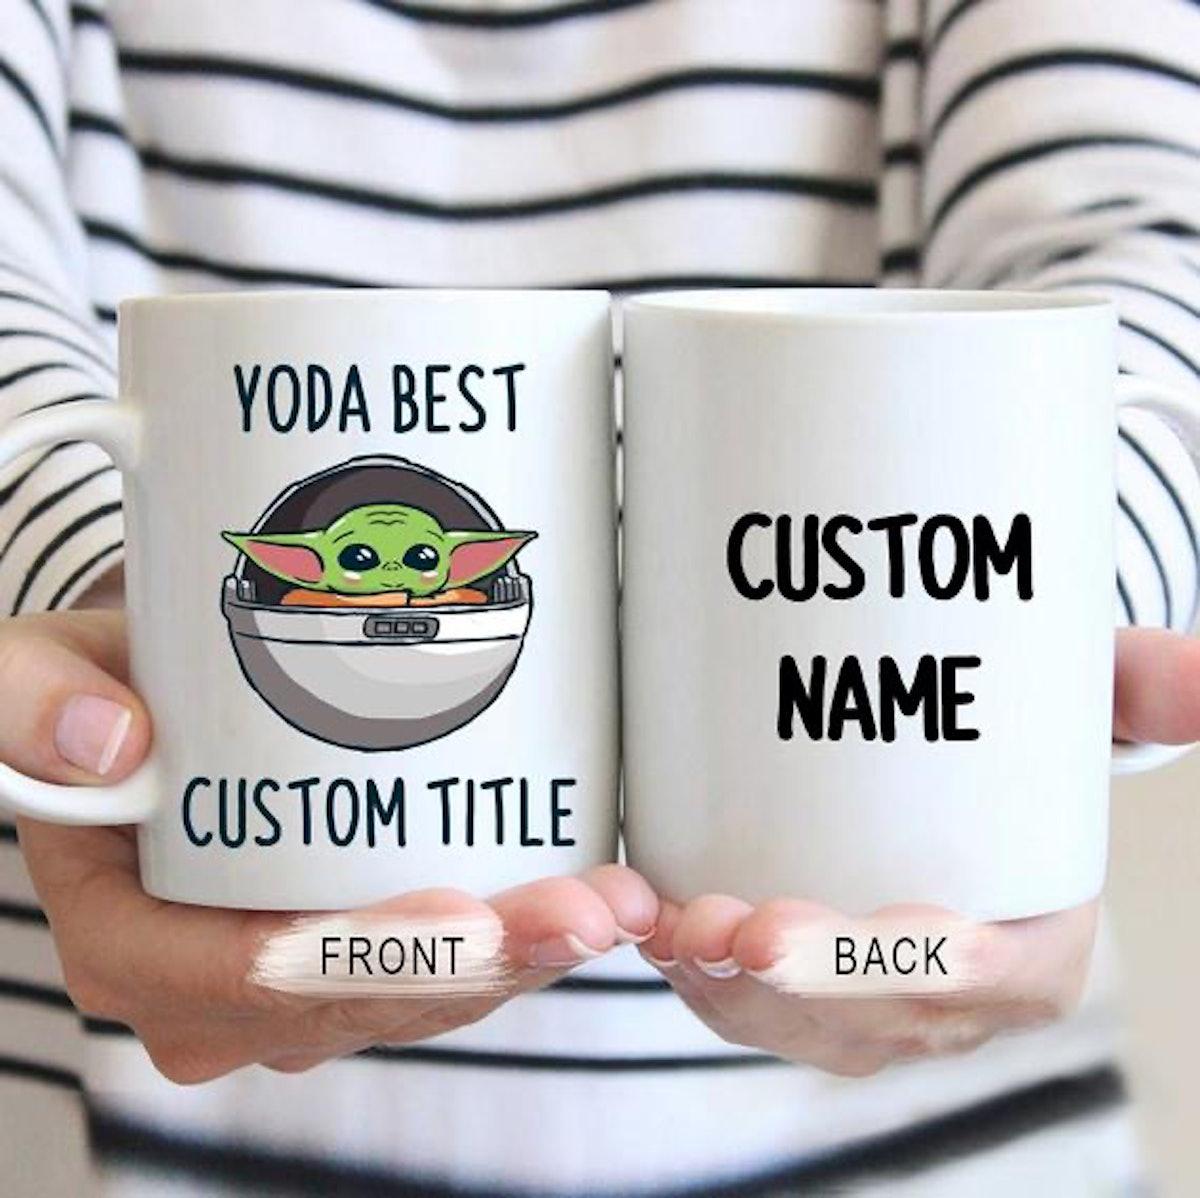 Custom Yoda Best Mug, Personalized Baby Yoda